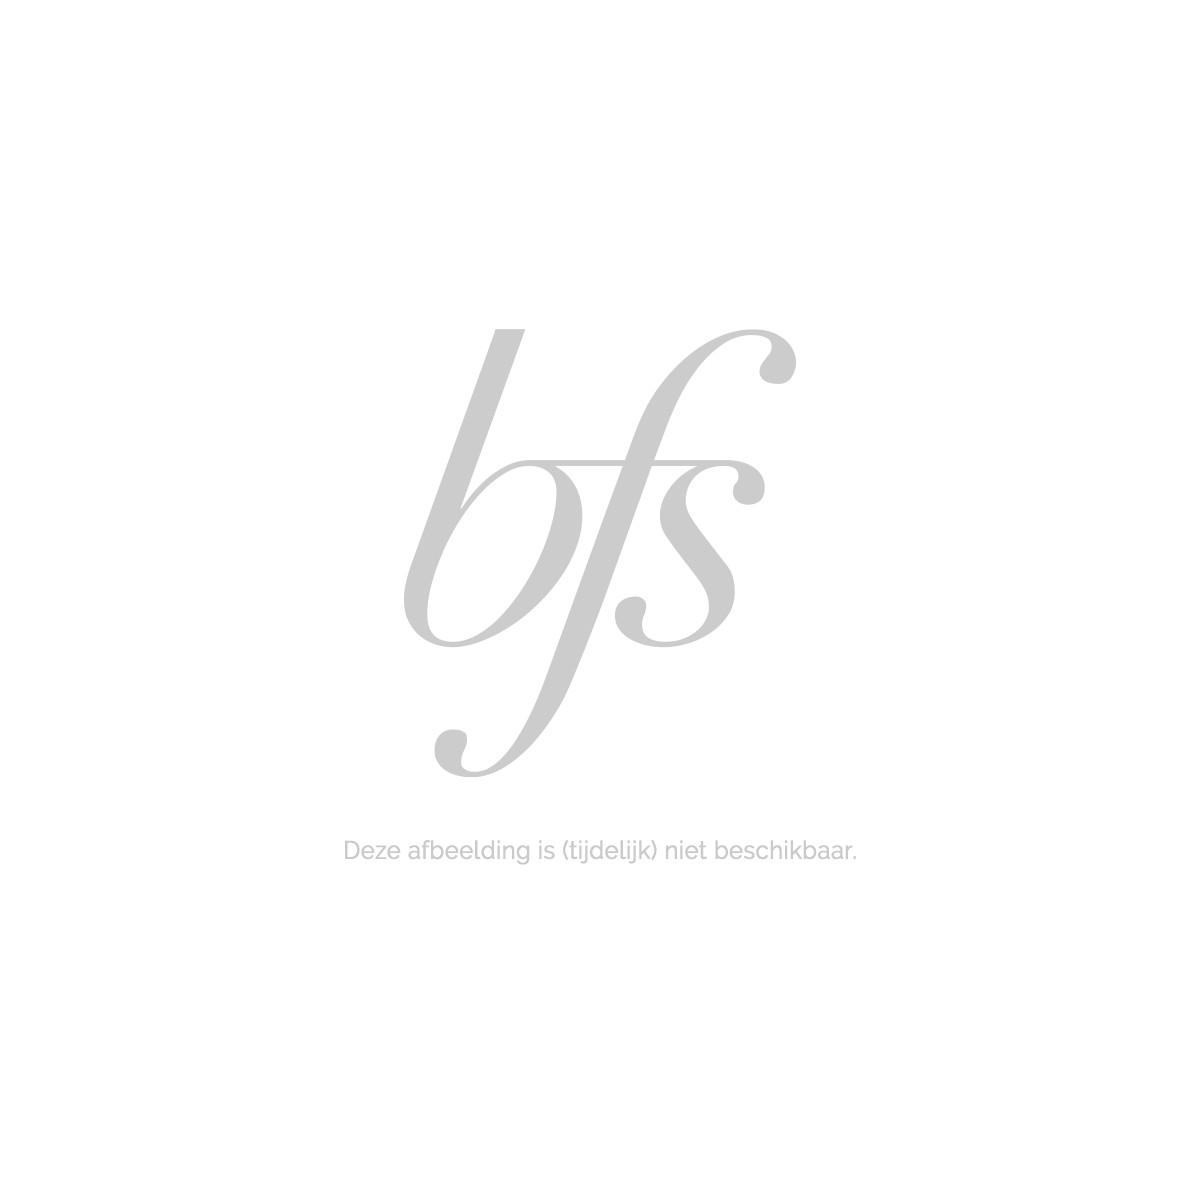 Pupa Nail Lasting Color 802 Transparent Silver Glitter